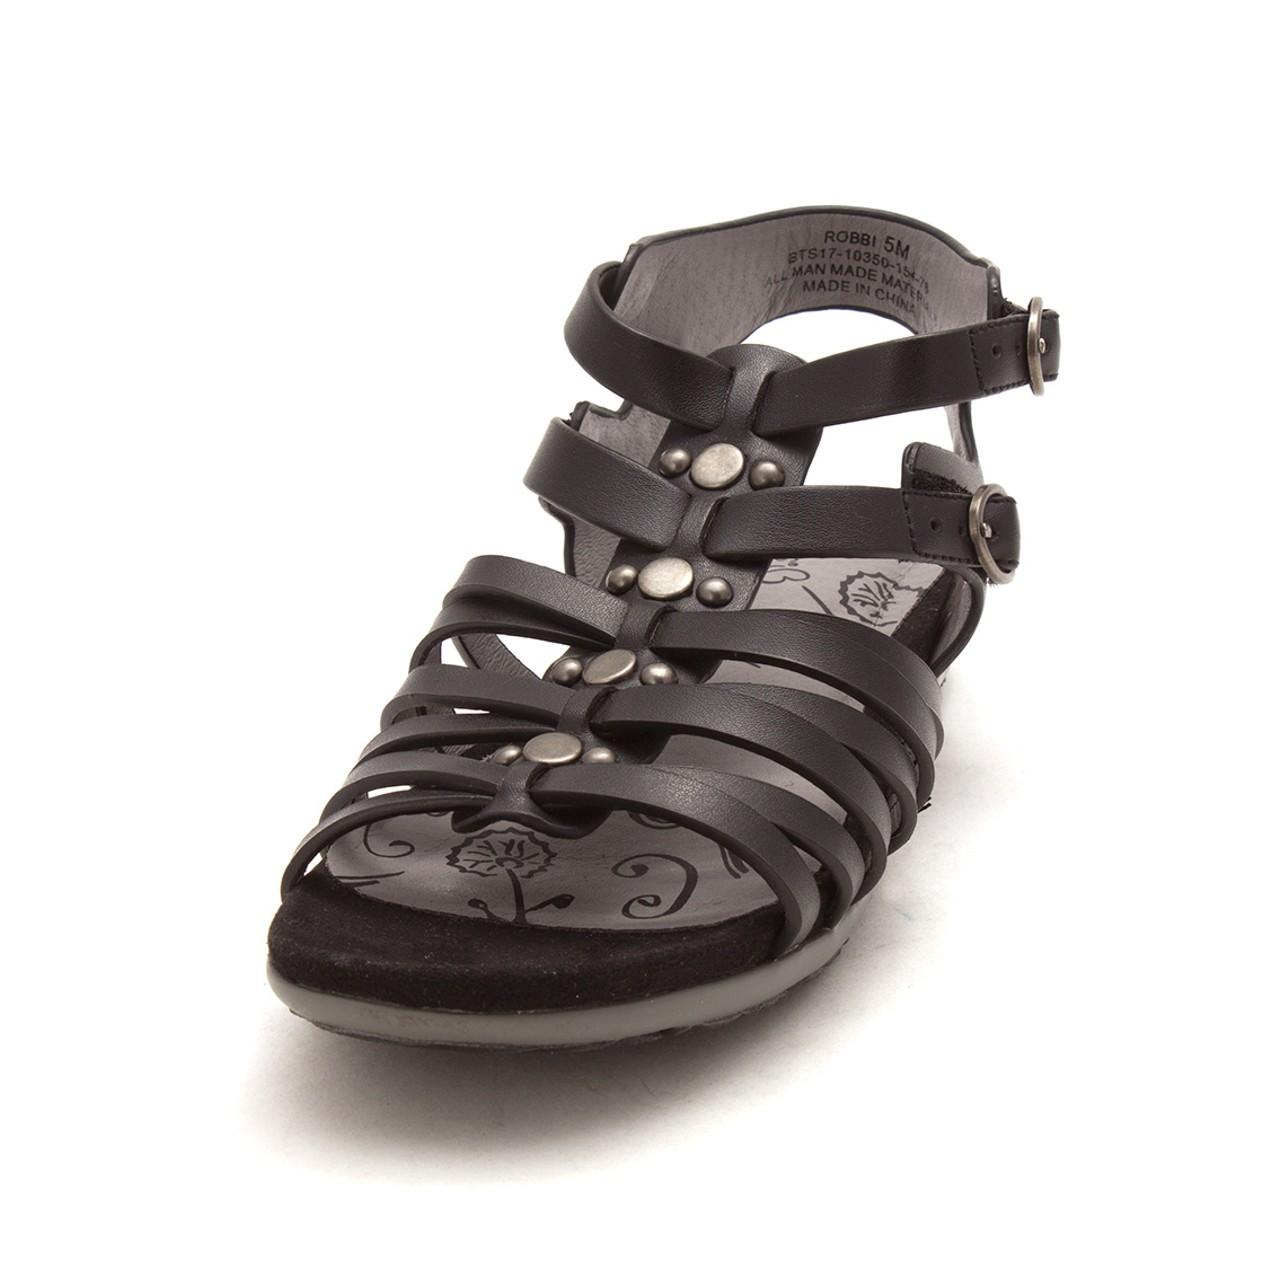 f0f14df48eaf Bare Traps Womens Robbi Open Toe Casual Gladiator Sandals - Tanga